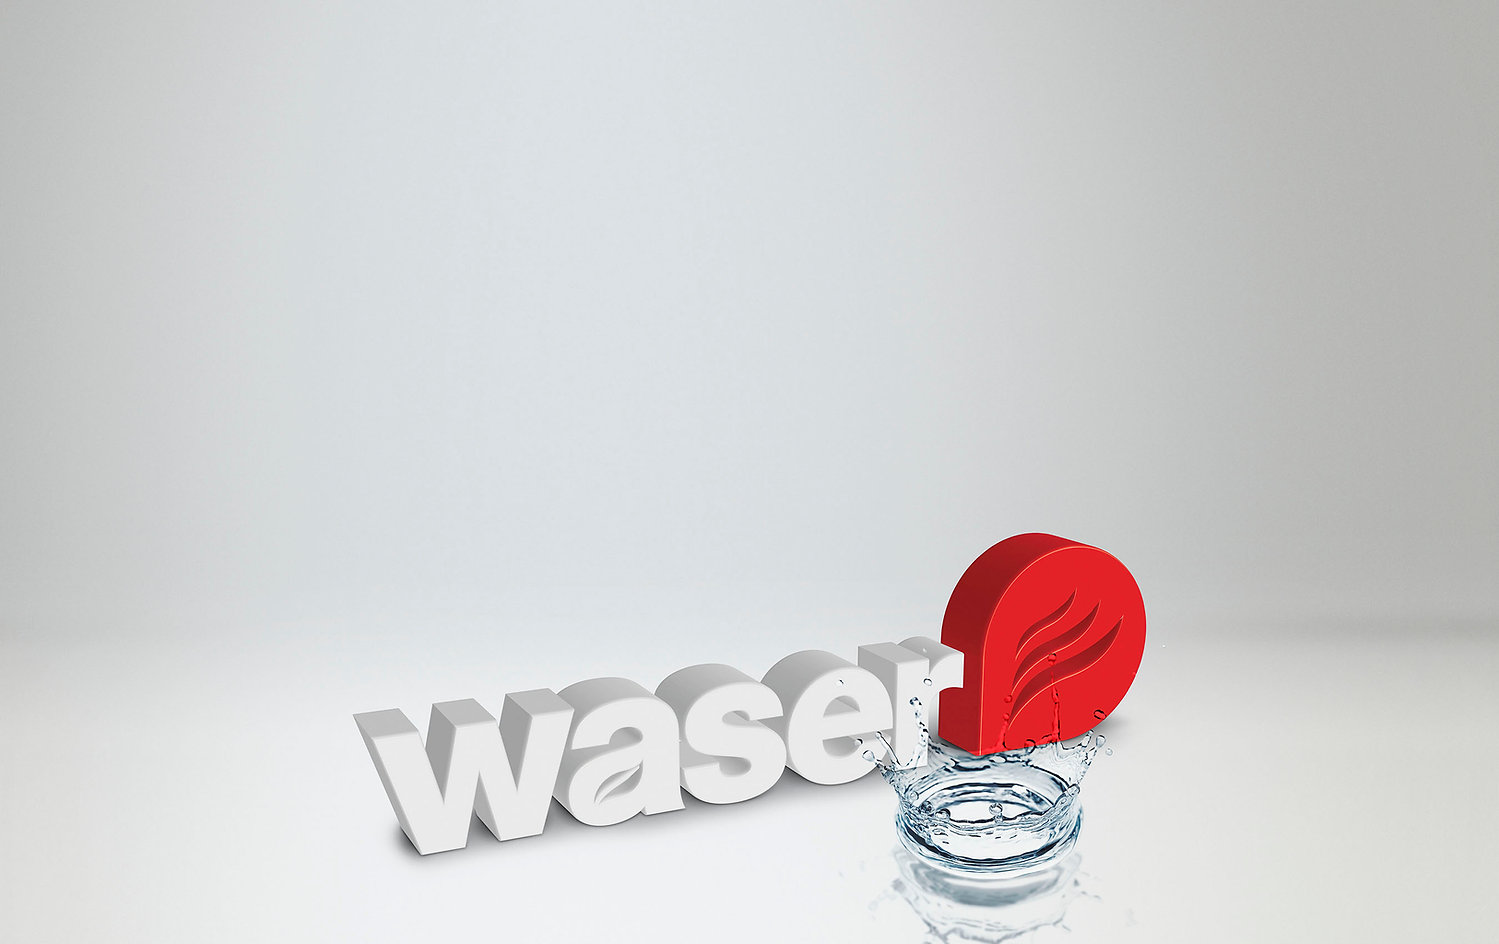 Waser_3d_Schrift_Raum_mont_hell_Homepage